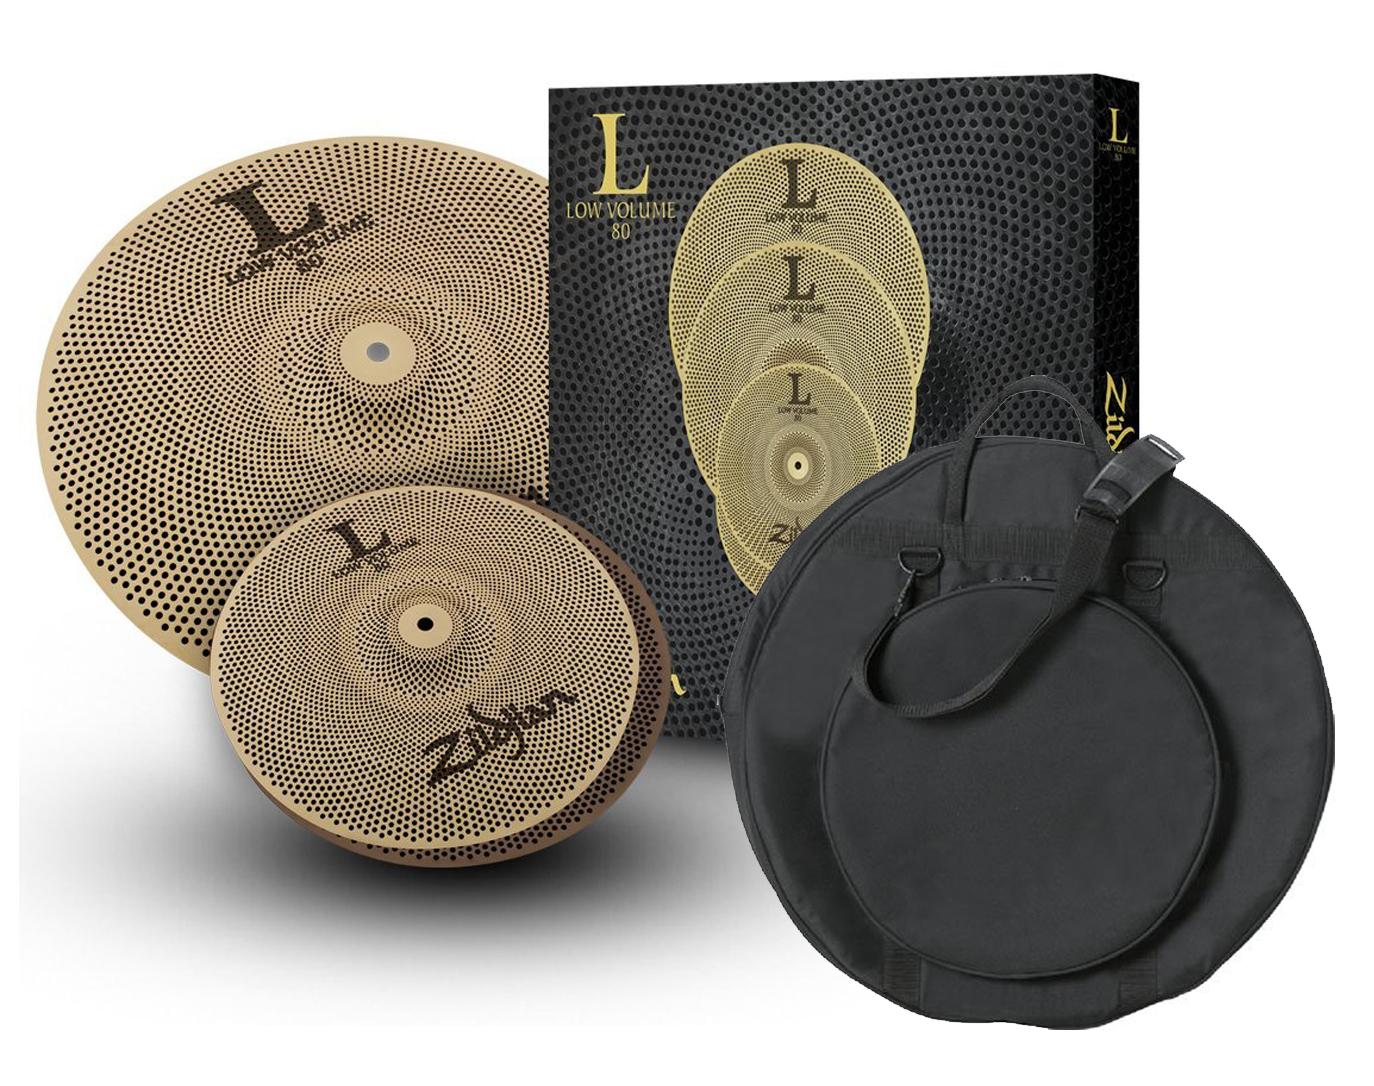 zildjian lv38 low volume l80 13 18 lv 38 drum cymbal box set with bag. Black Bedroom Furniture Sets. Home Design Ideas